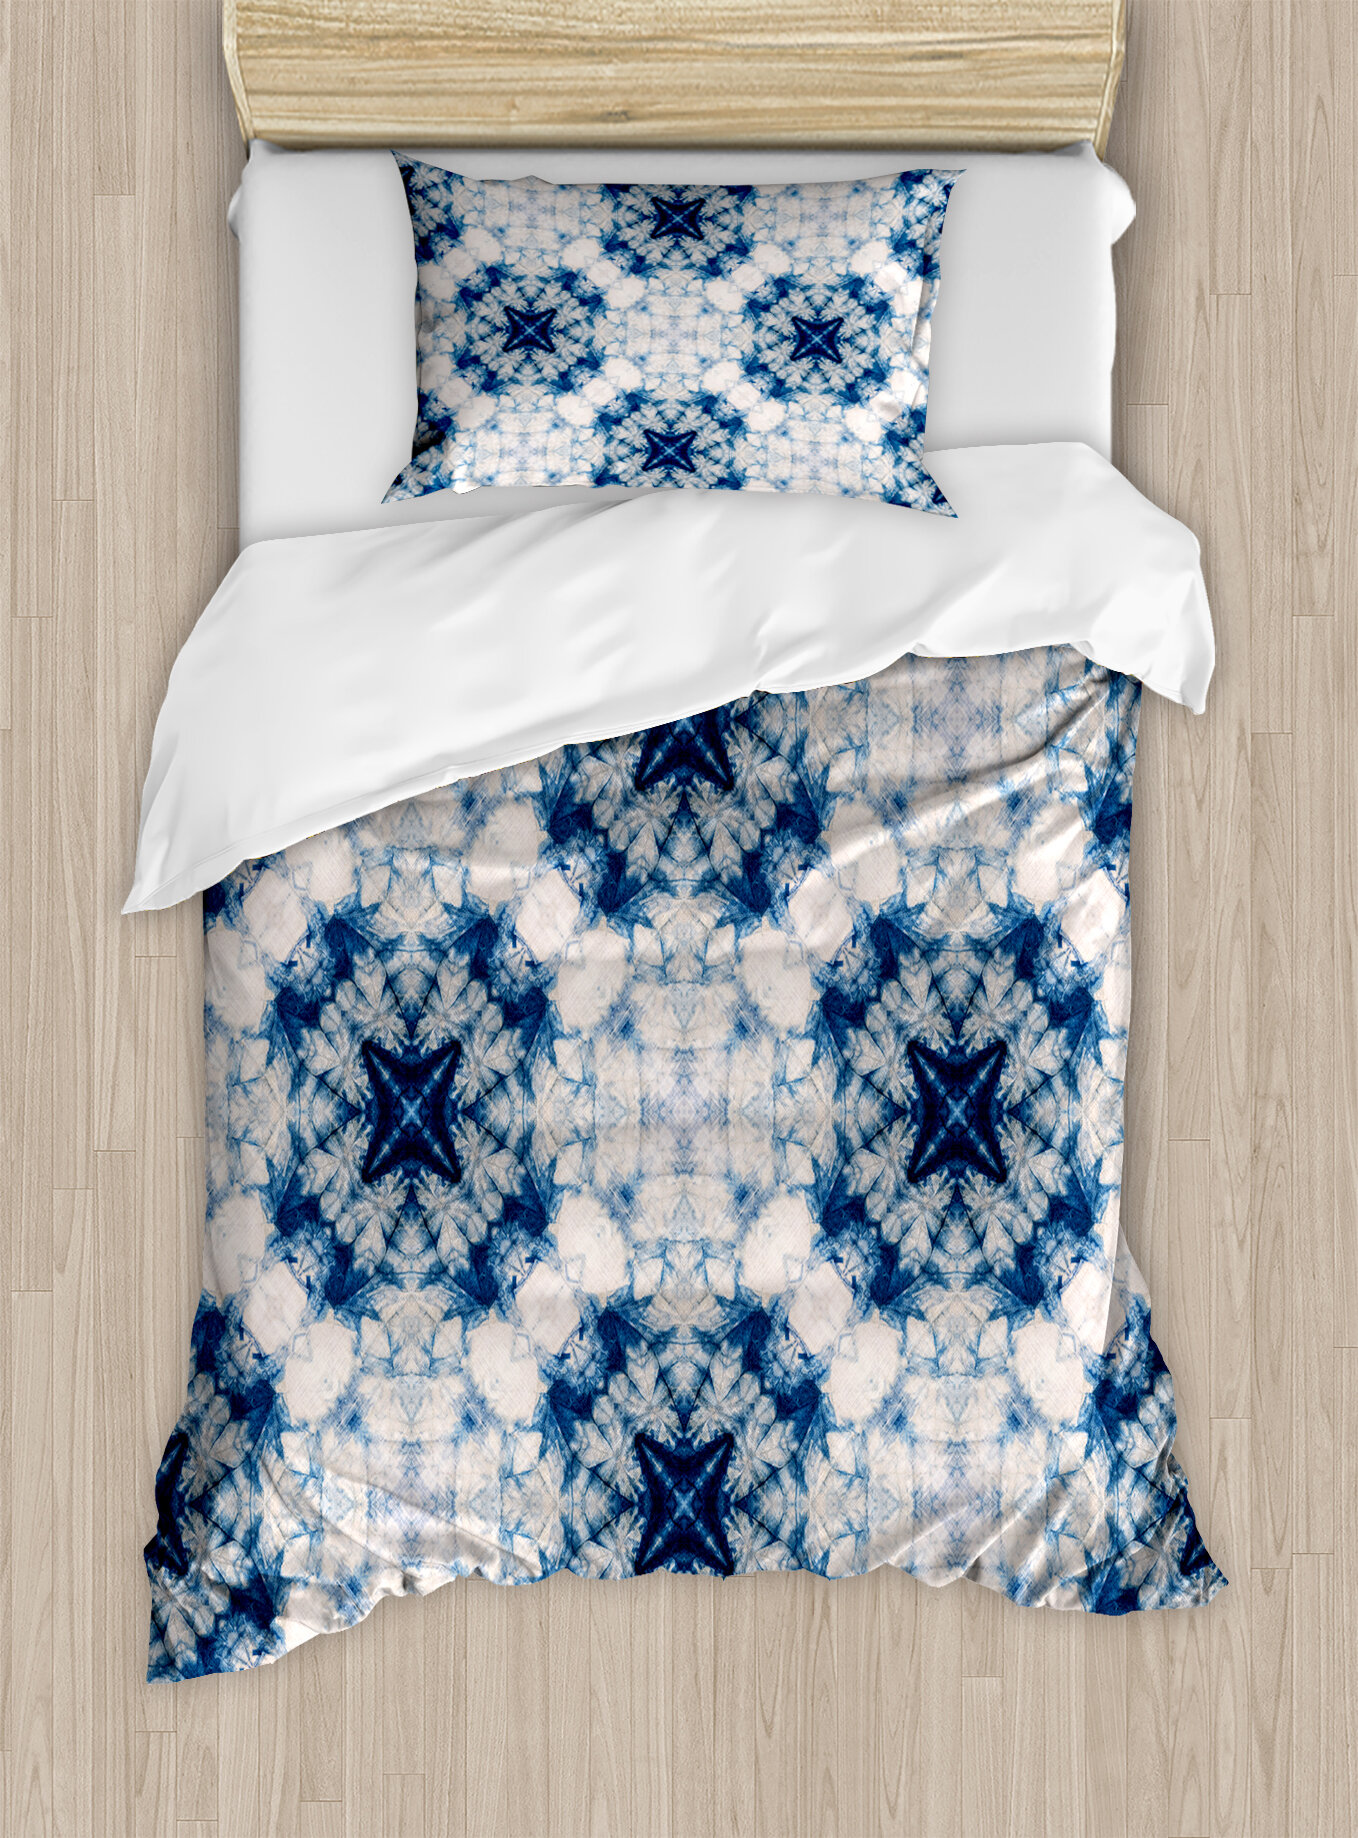 East Urban Home Blue Floral Duvet Cover Set Wayfair